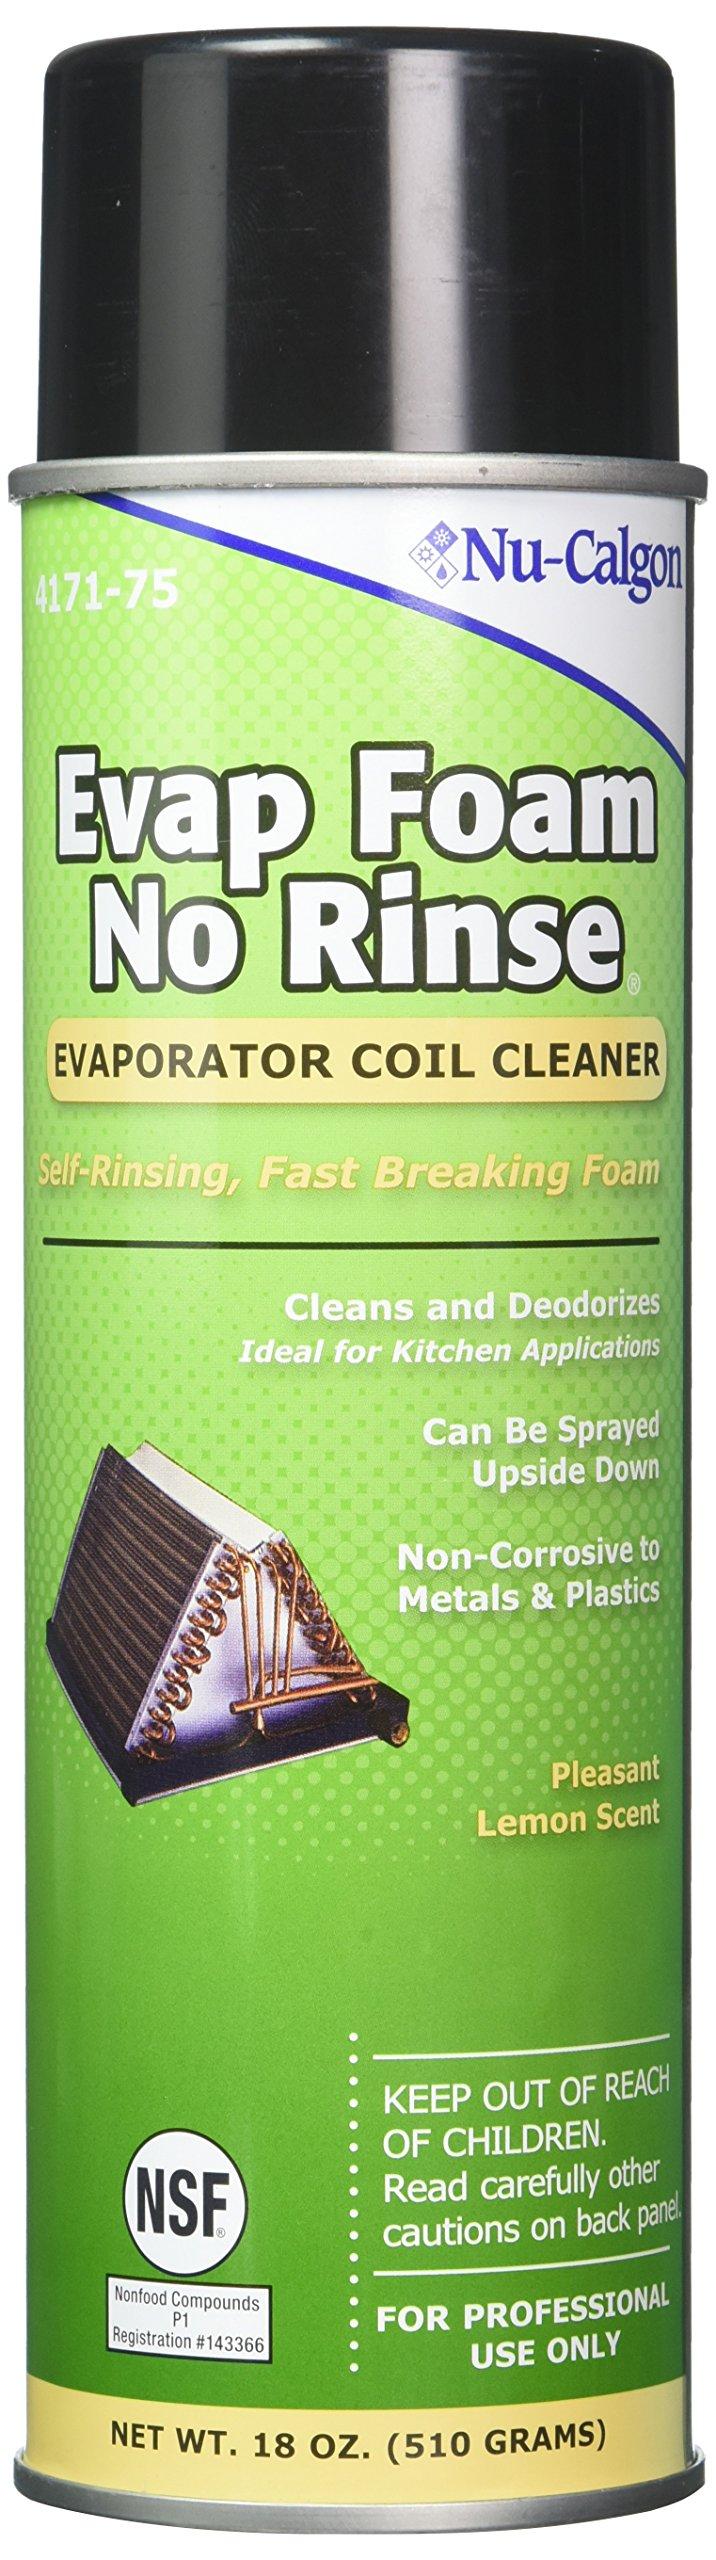 Nu-Calgon 4171-75 Evap Foam No Rinse Evaporator Coil Cleaner, 18 oz. by Nu Calgon